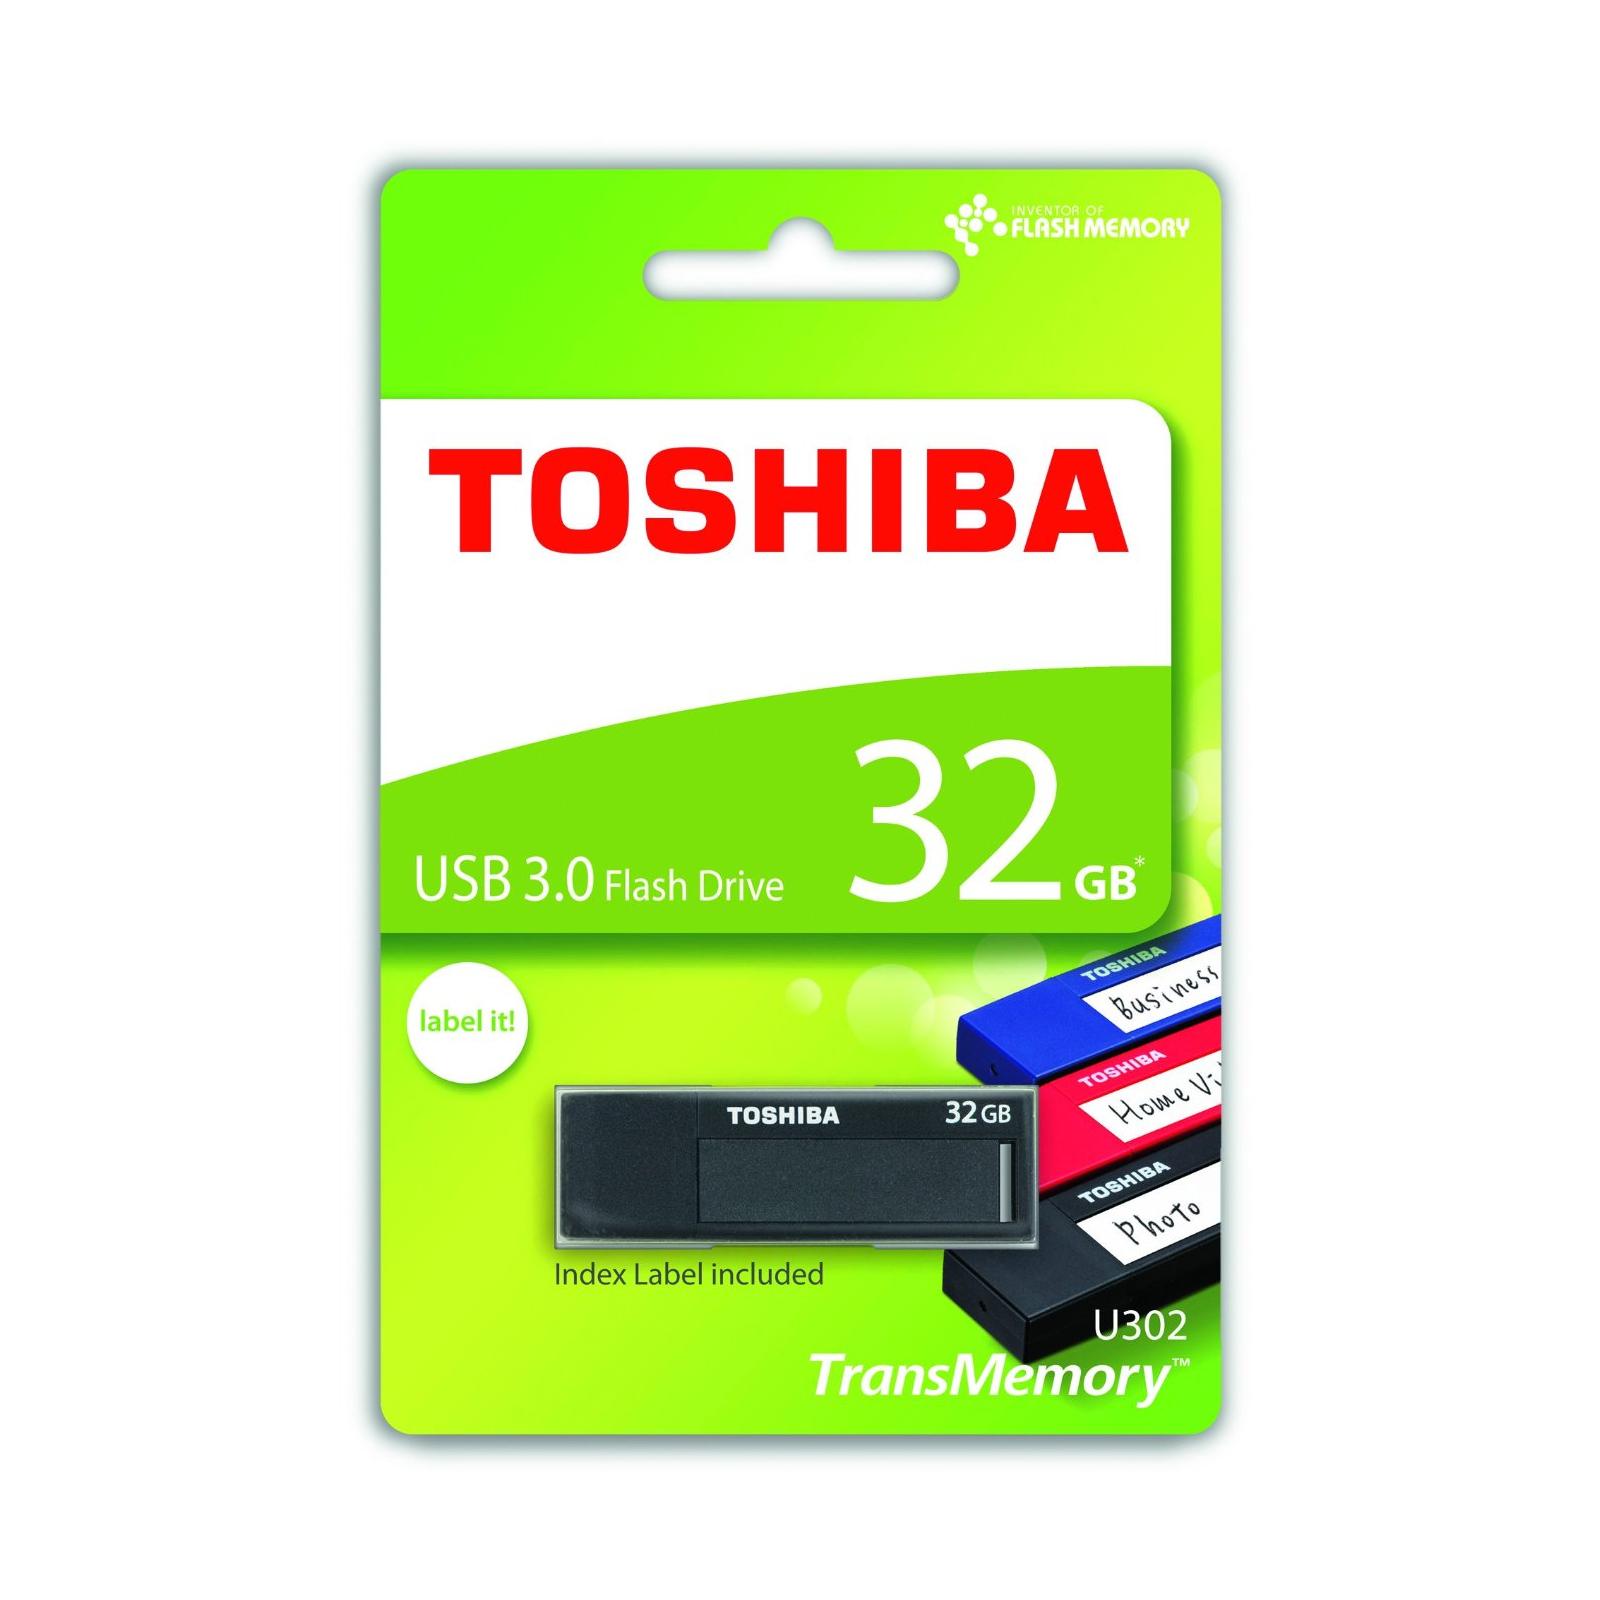 USB флеш накопитель TOSHIBA 32GB Daichi Black USB 3.0 (THN-U302K0320M4) изображение 3